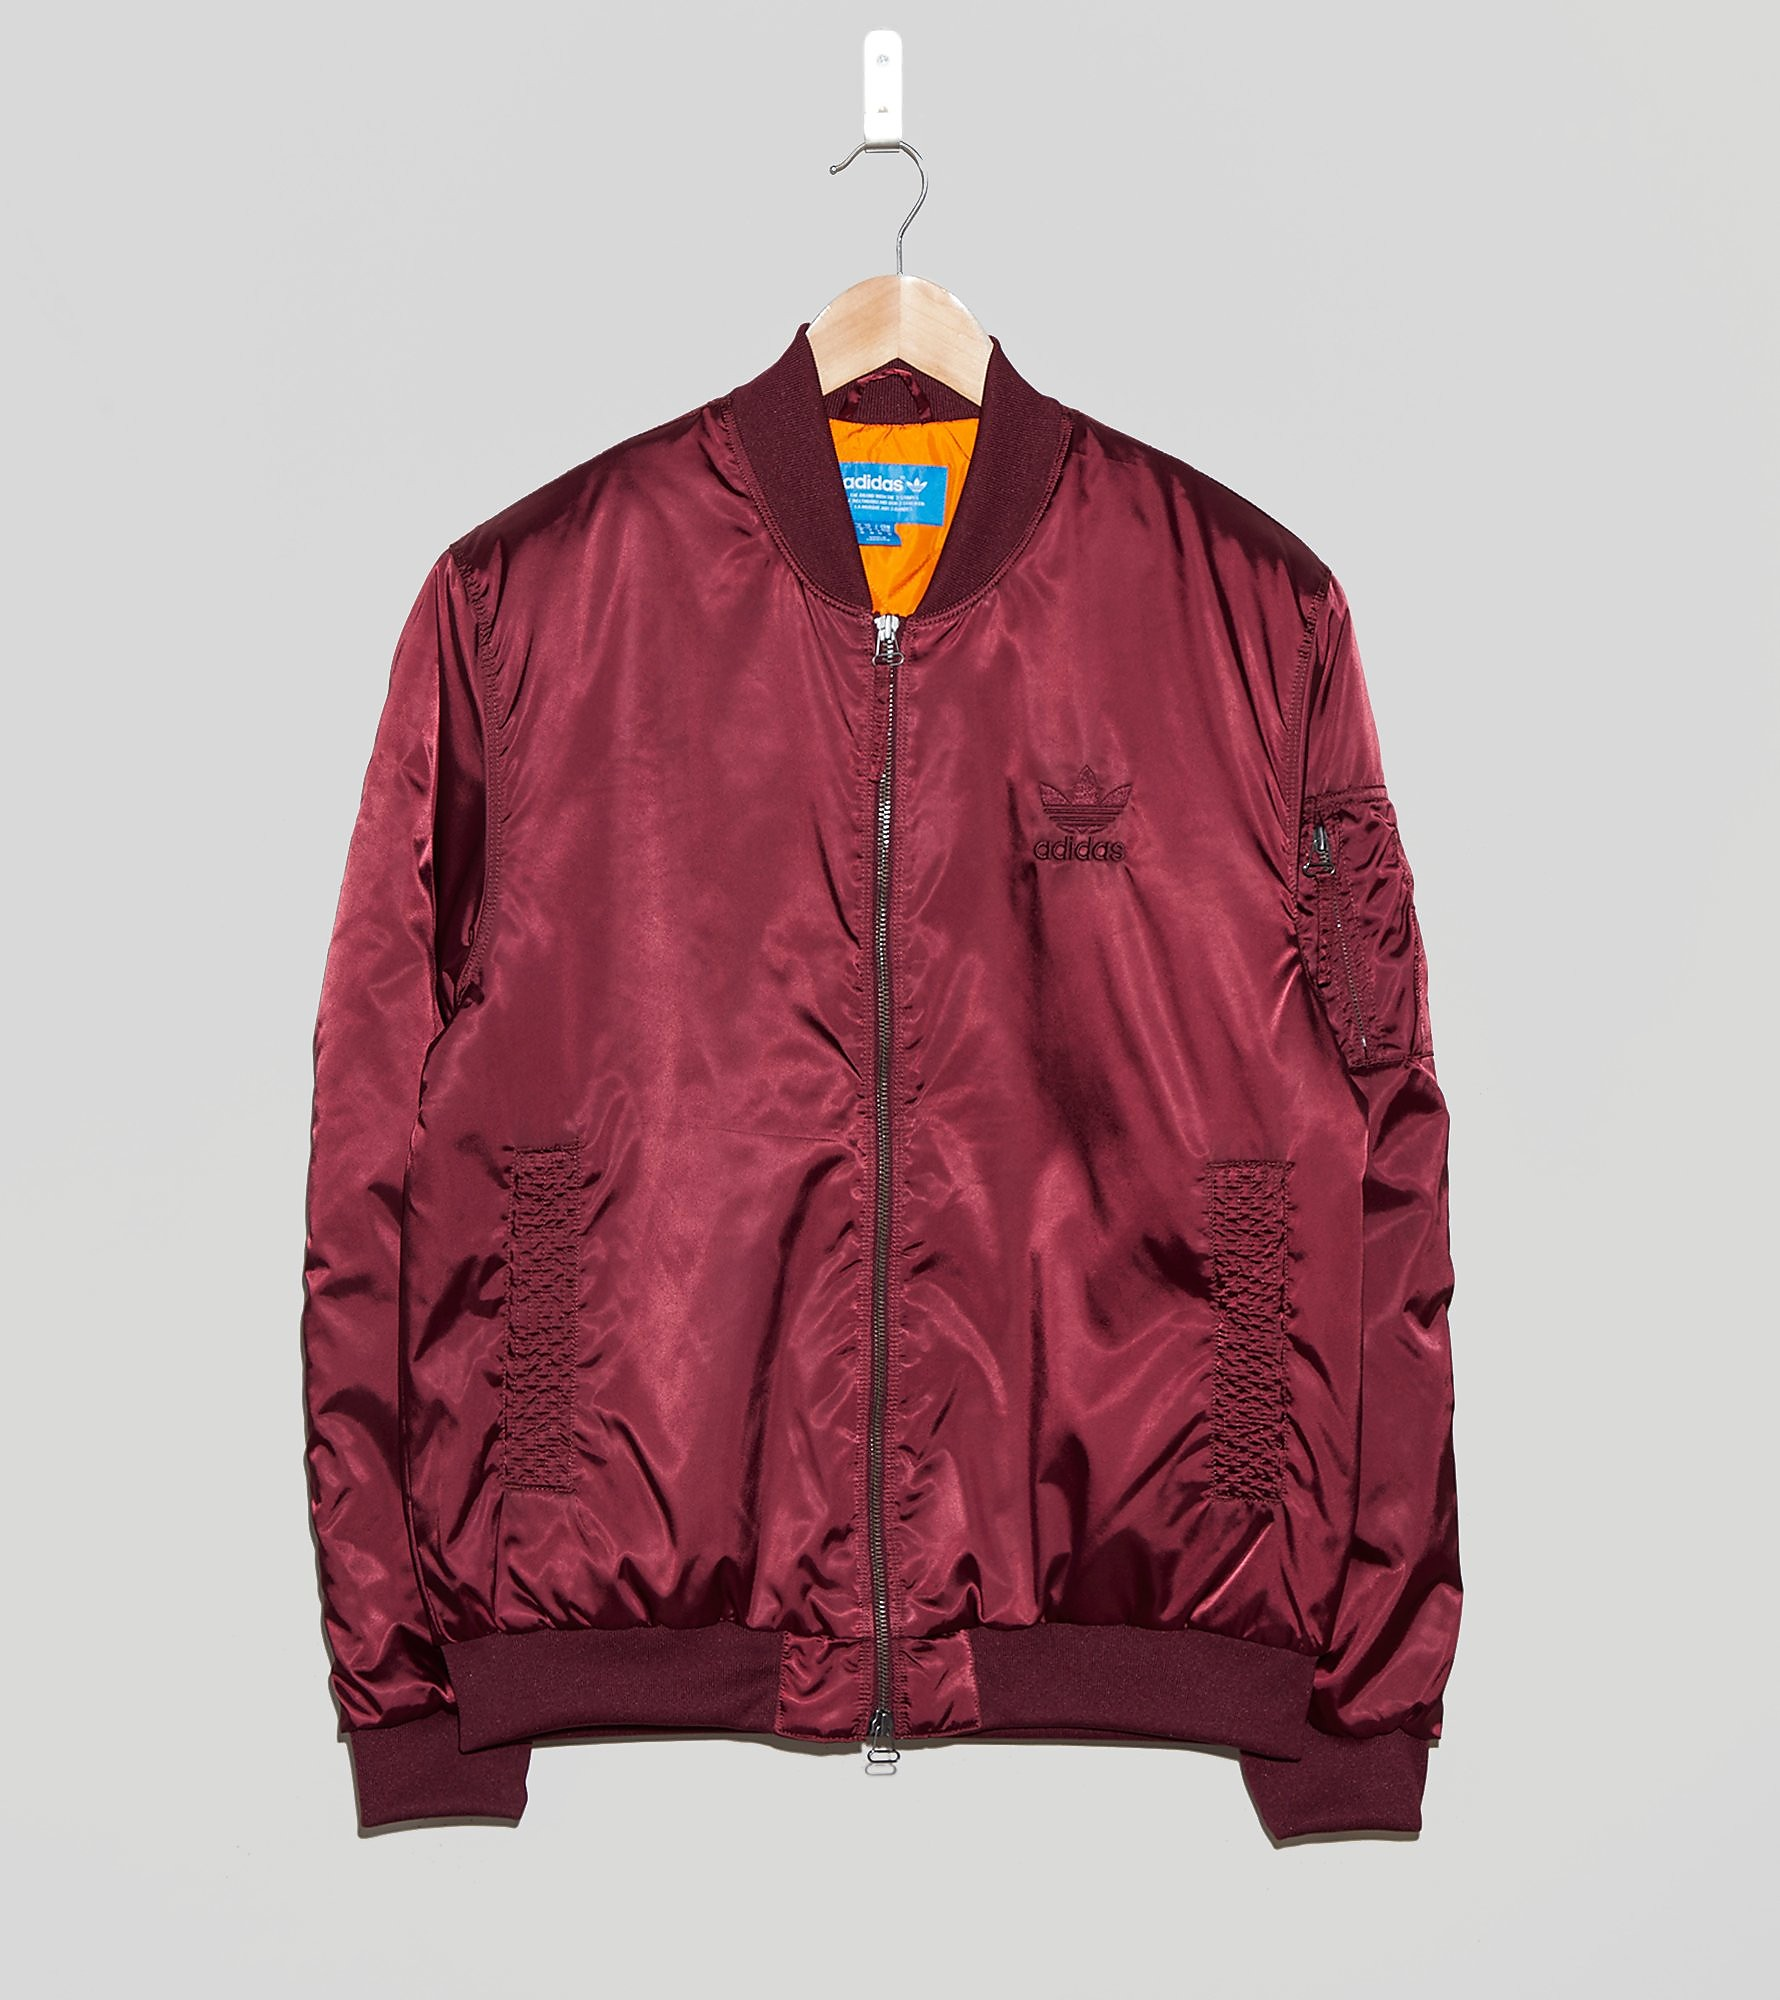 adidas Originals MA1 Superstar Bomber Jacket